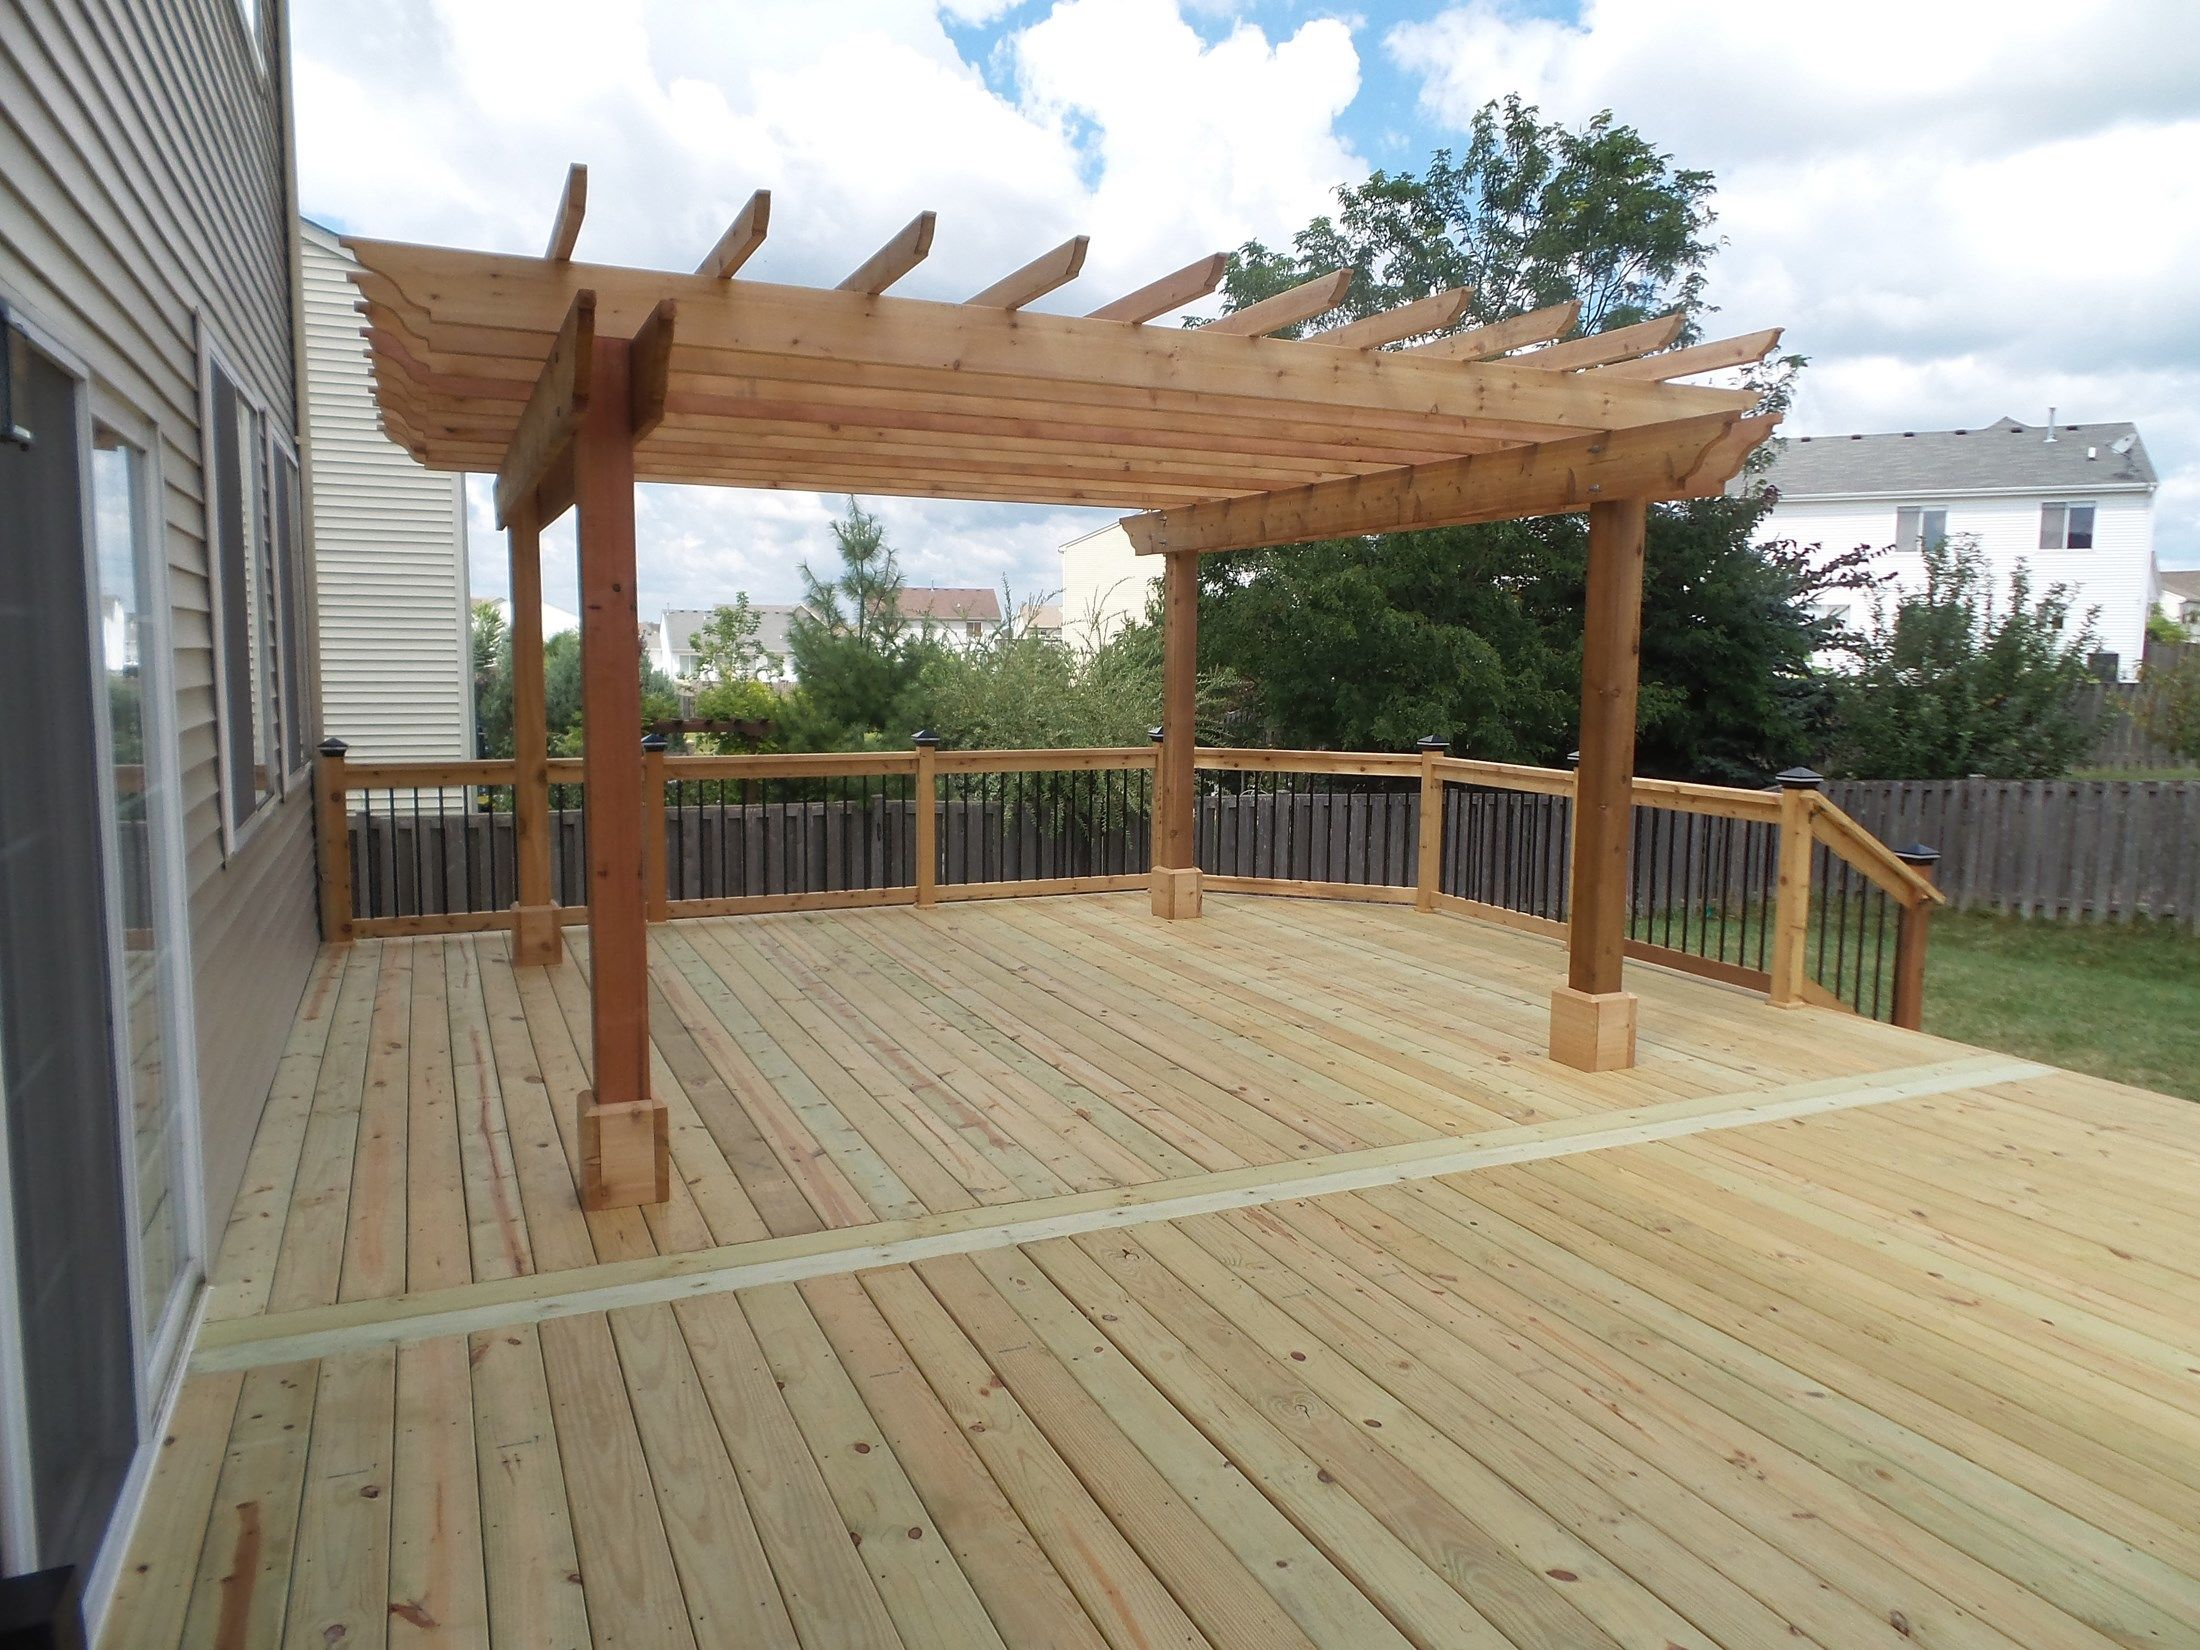 Deckscom Cedar Deck  Pergola  Picture 3638